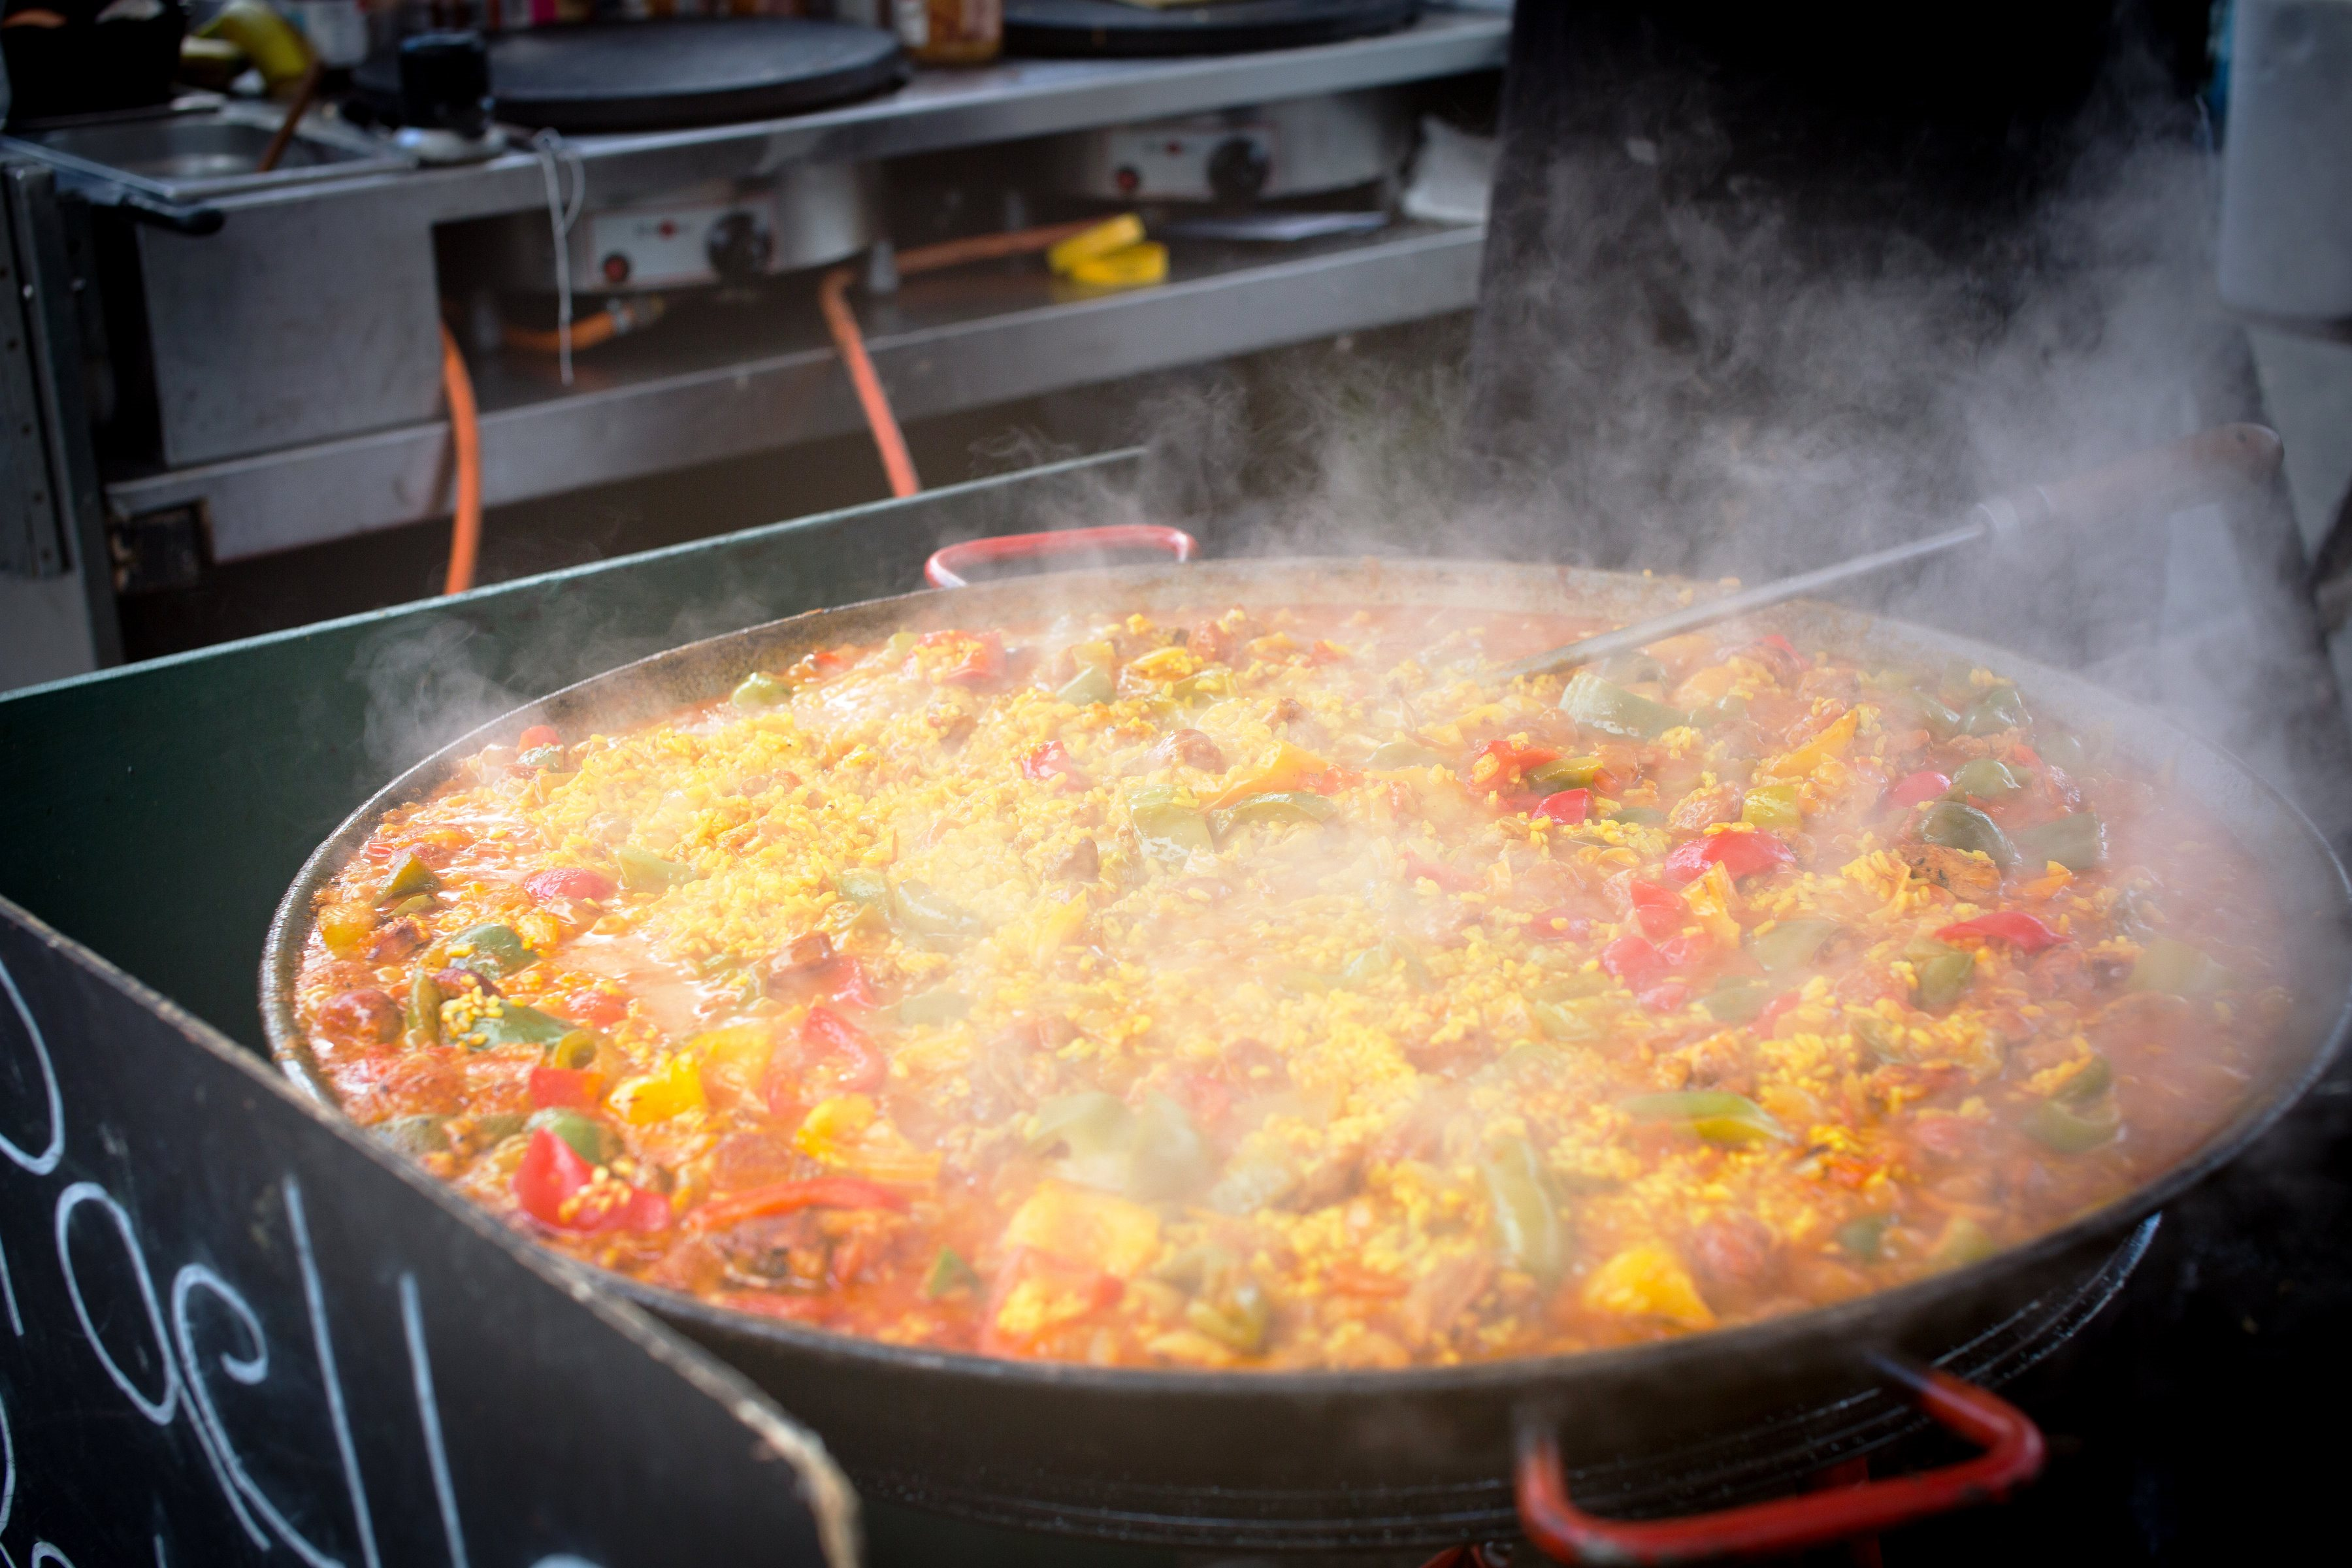 Uppingham Market food